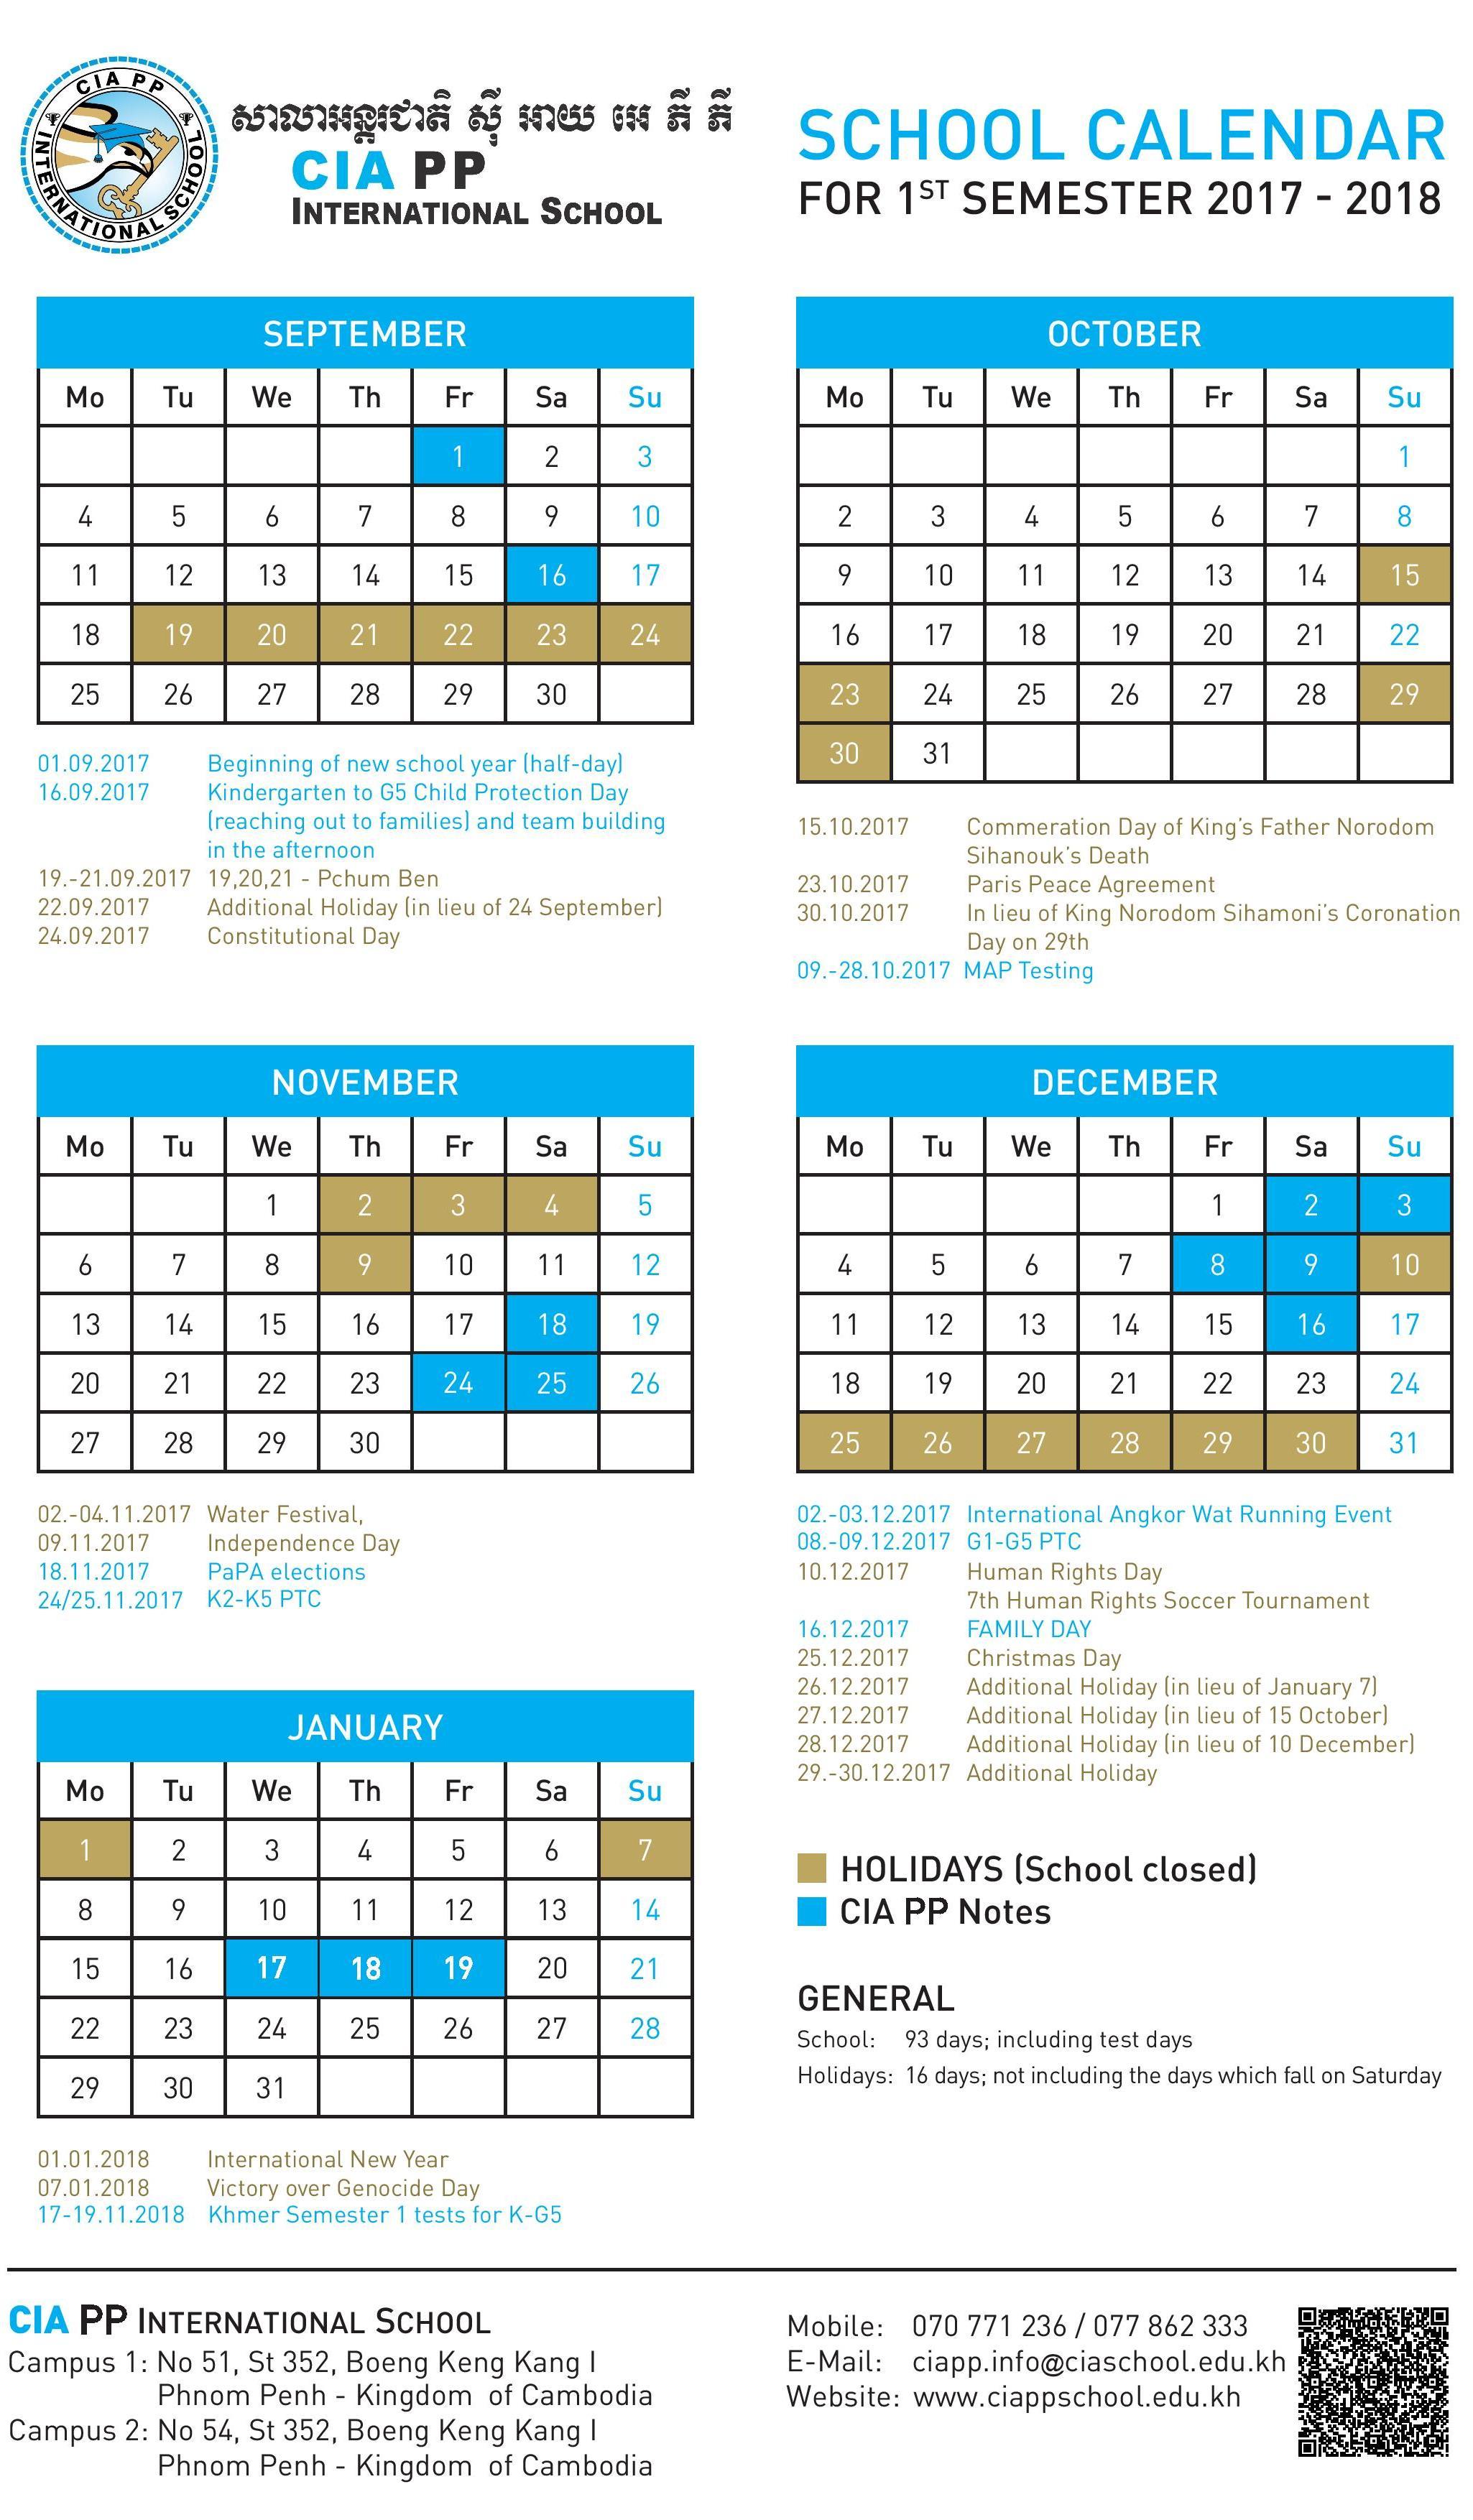 School Calendar in Khmer Calendar 2020 October